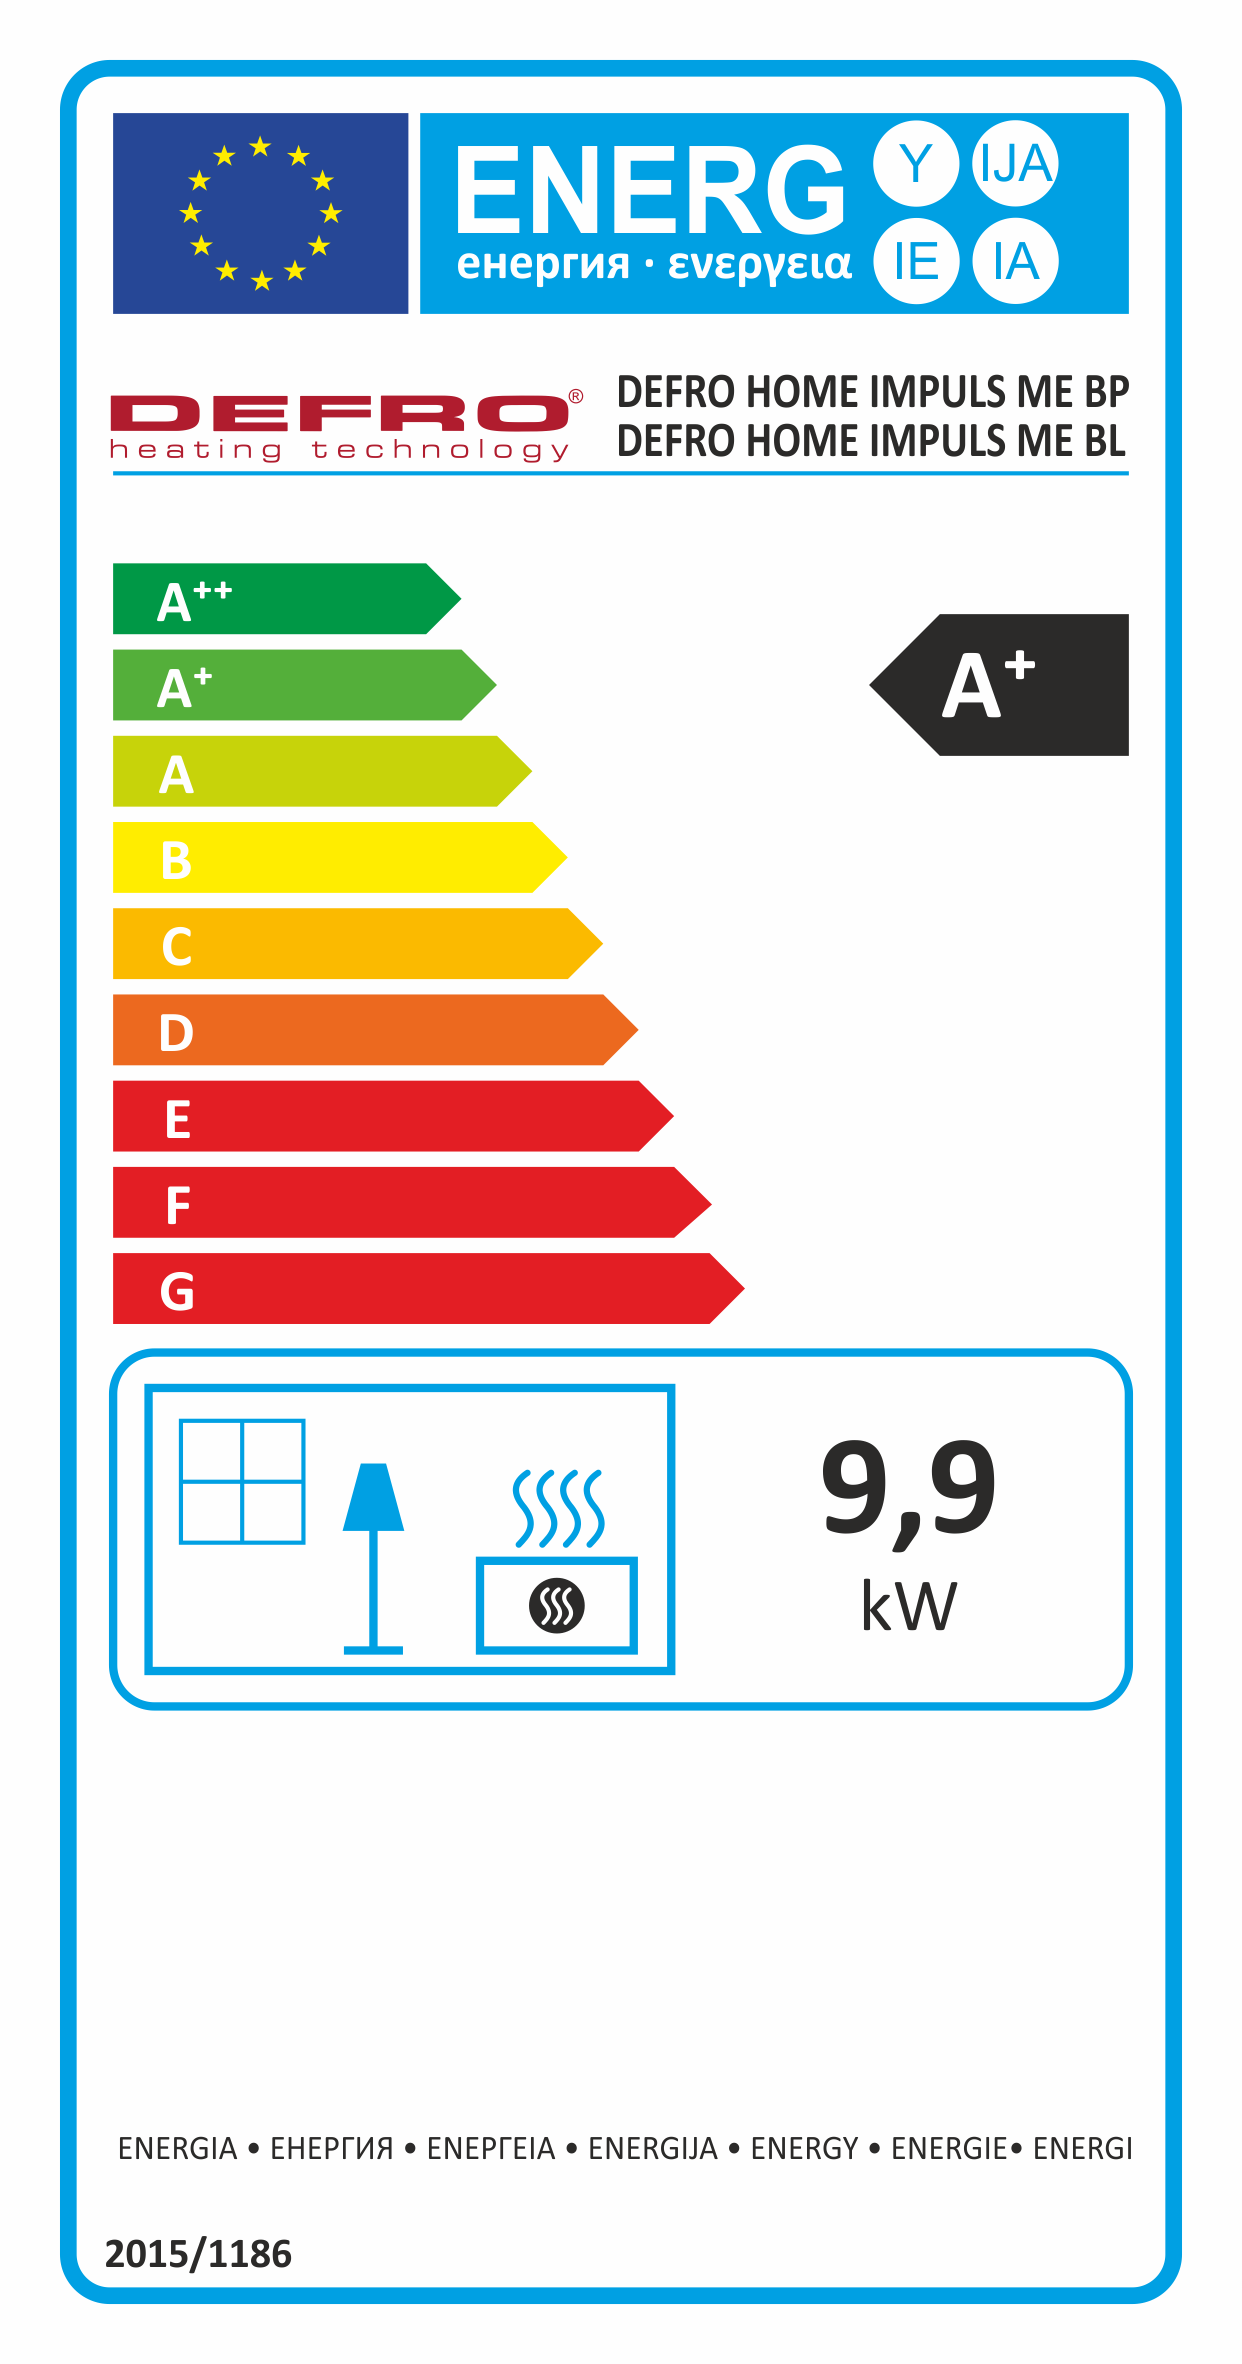 Defro Home Impuls ME BP energeticky stitok krbyonline